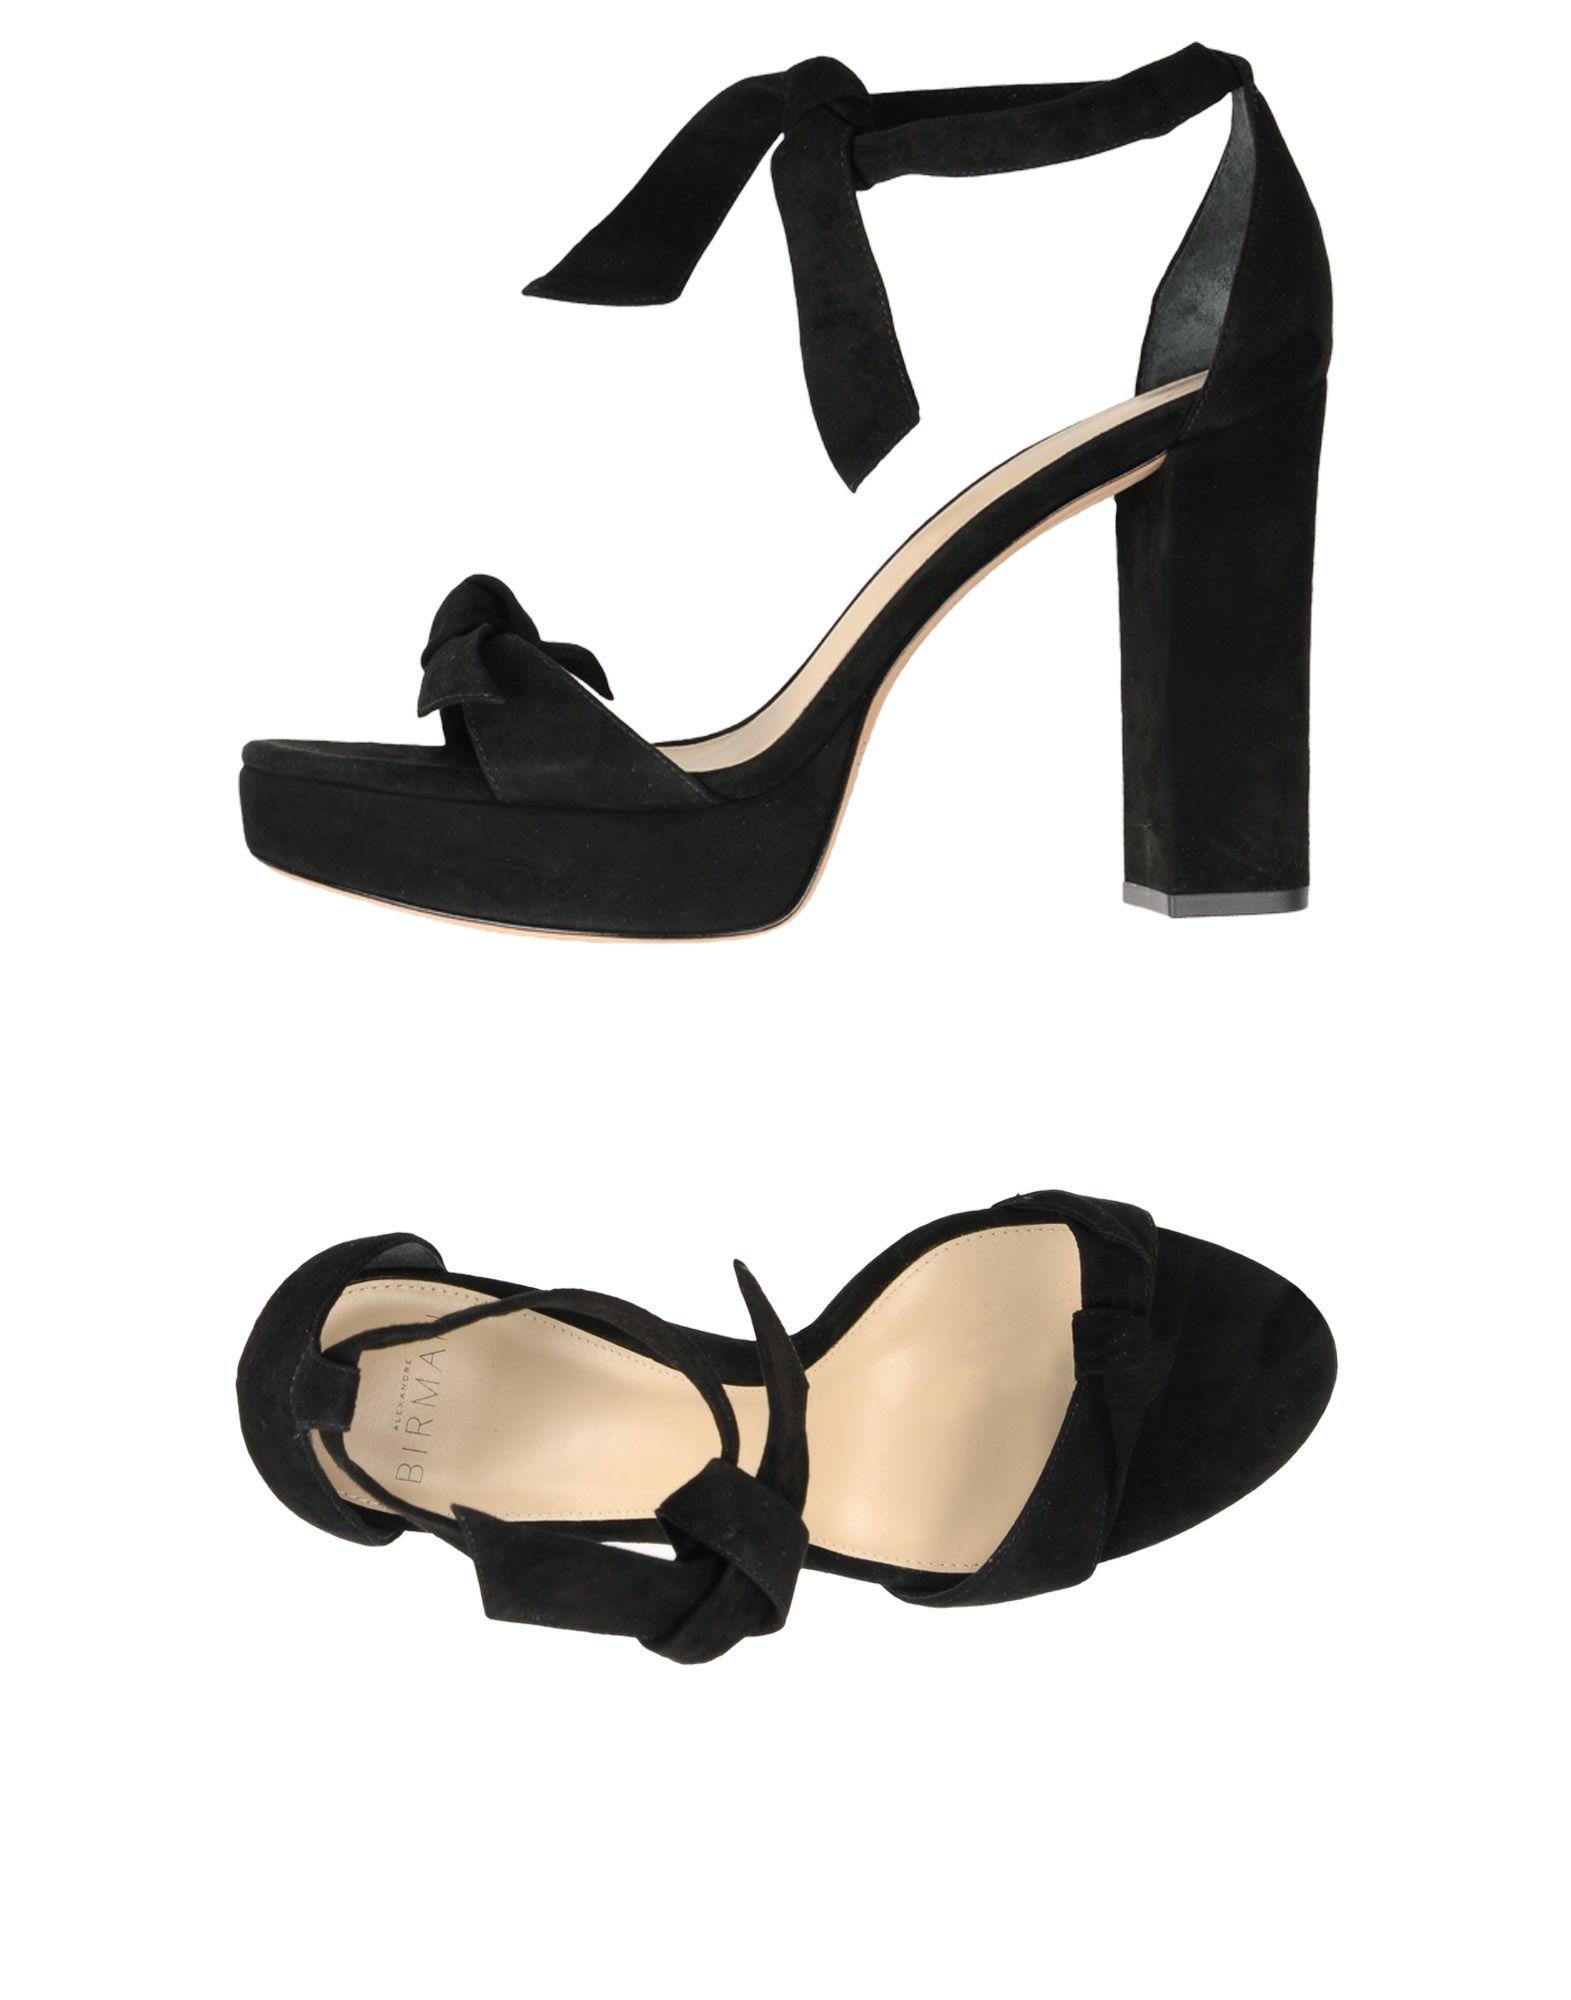 Alexandre Birman Sandalen Damen Beliebte  11417440SU Beliebte Damen Schuhe 131e92